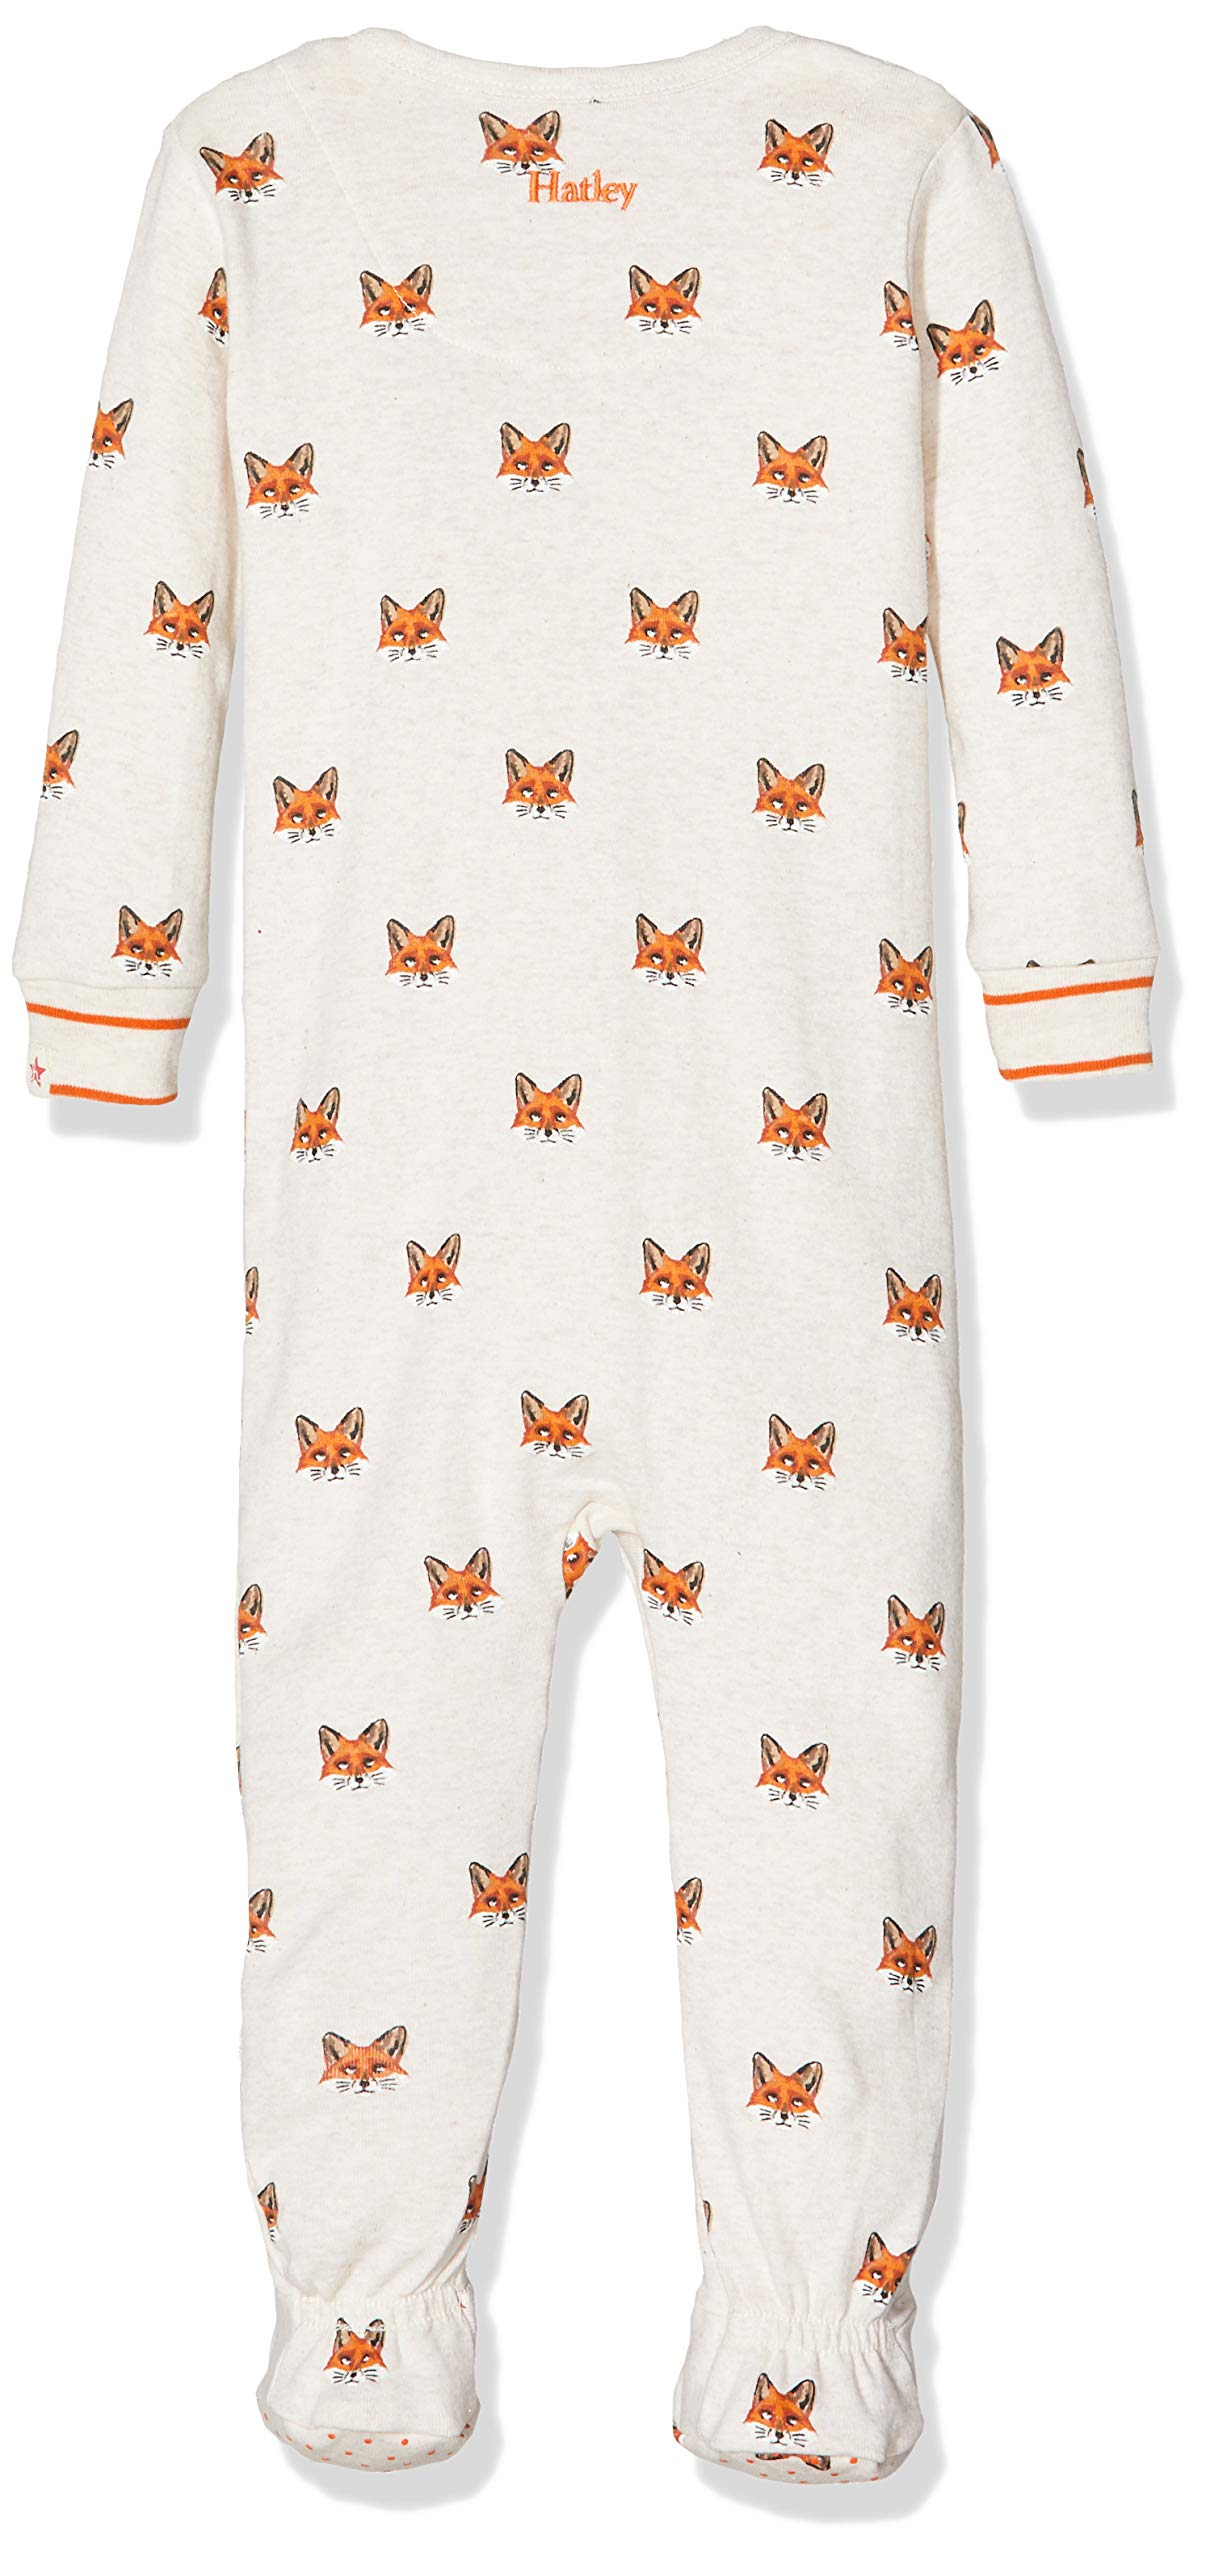 Hatley Organic Cotton Footed Sleepsuit Pelele para Dormir para Bebés 2